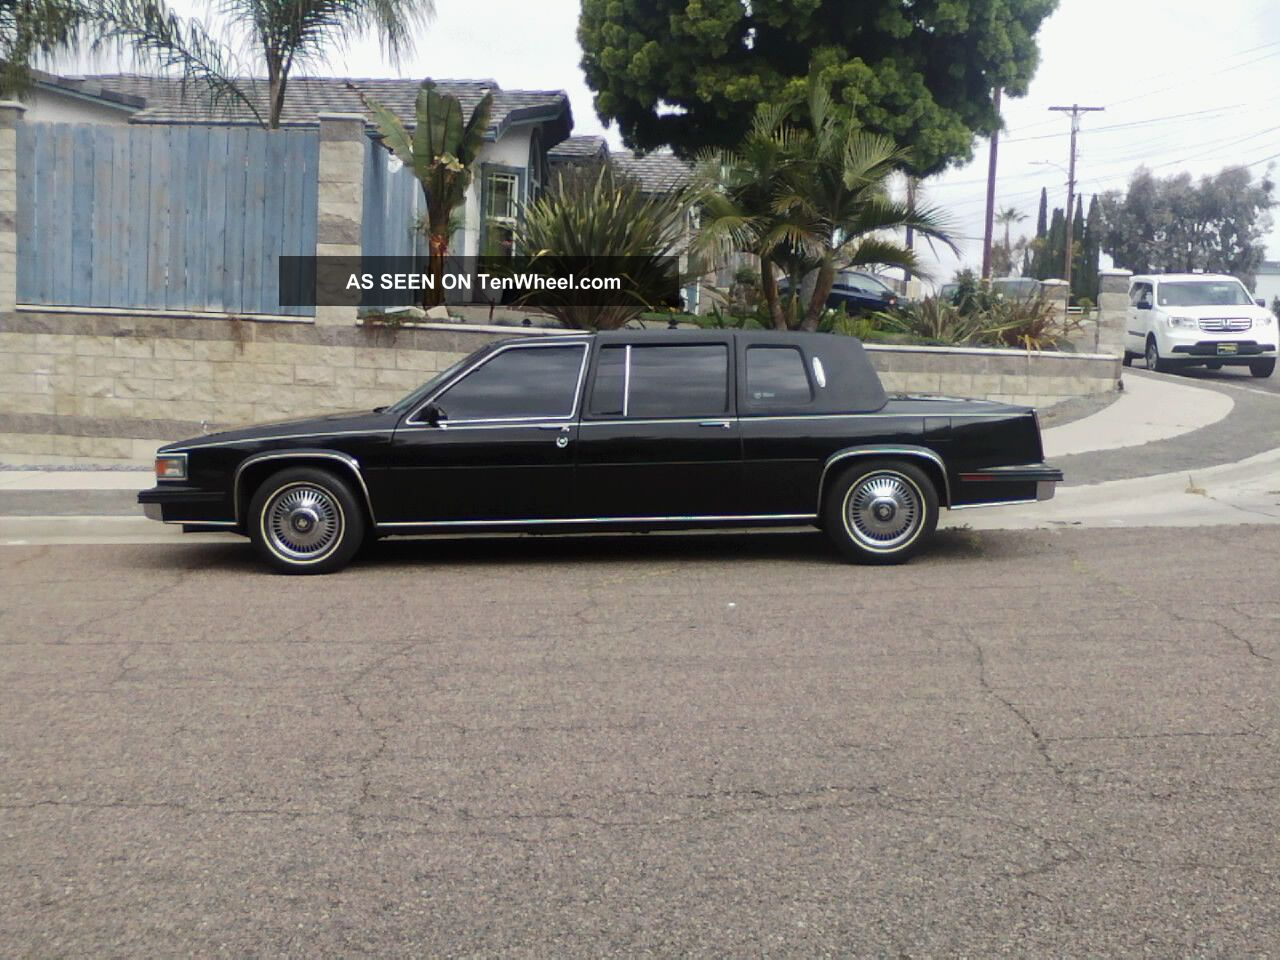 1985 Cadillac Fleetwood Series 75 Limousine